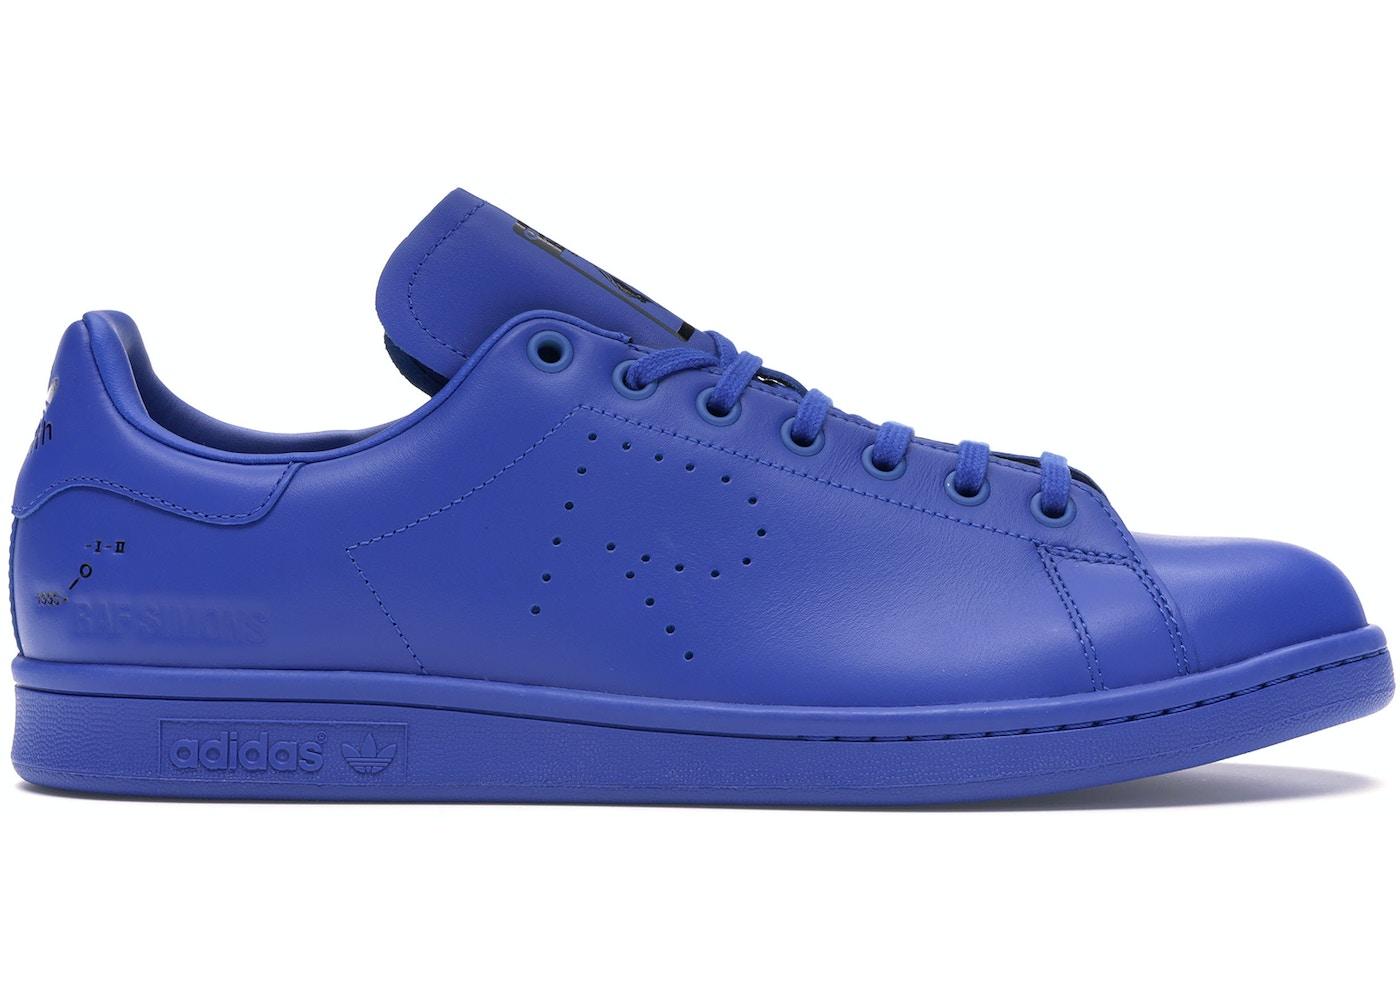 new styles 7ff38 0b0e9 adidas Stan Smith Raf Simons Powder Blue